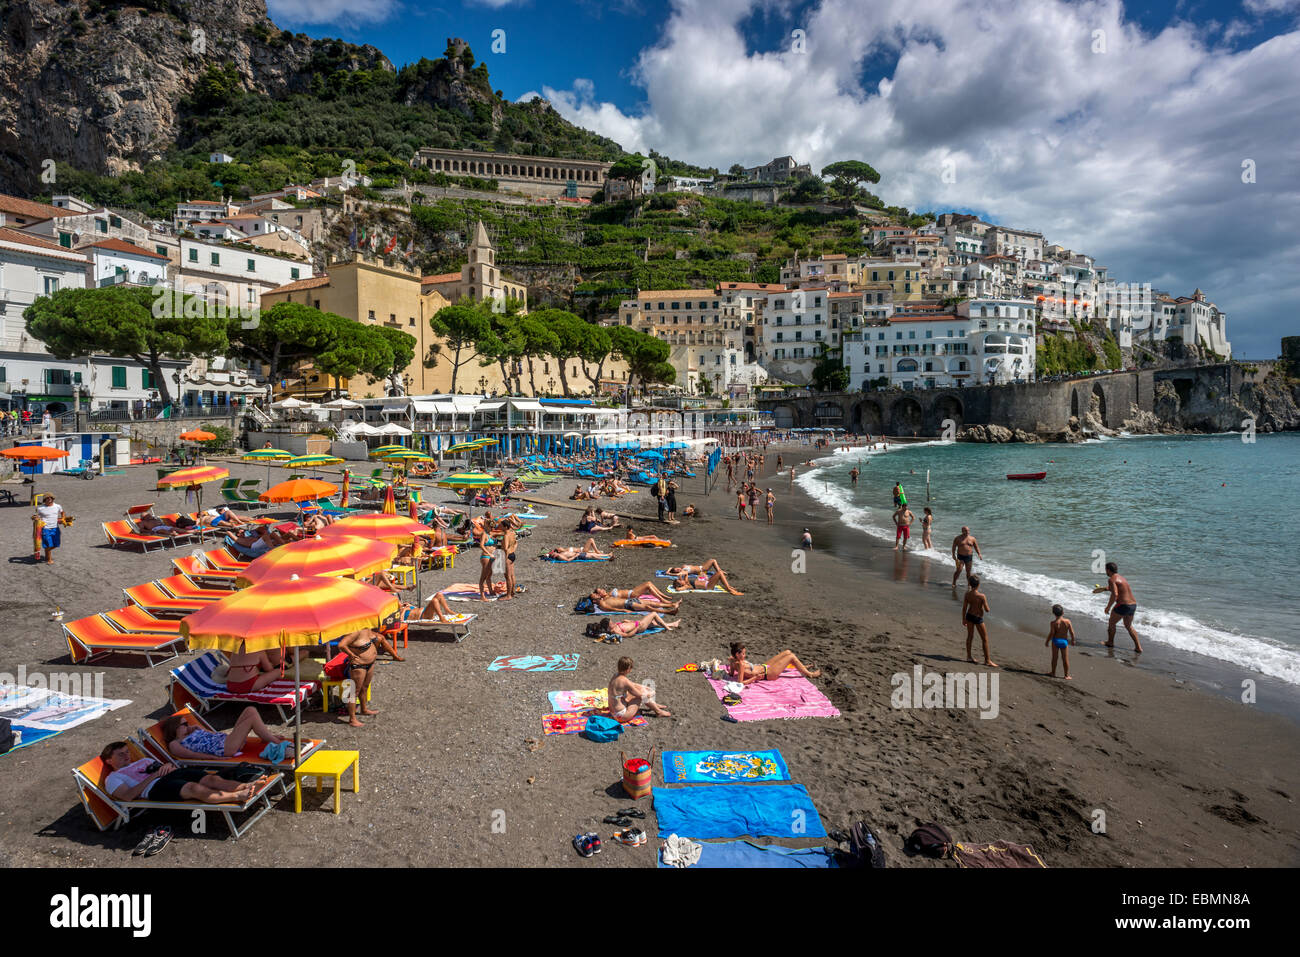 The beach at Amalfi in Campania, Italy. - Stock Image